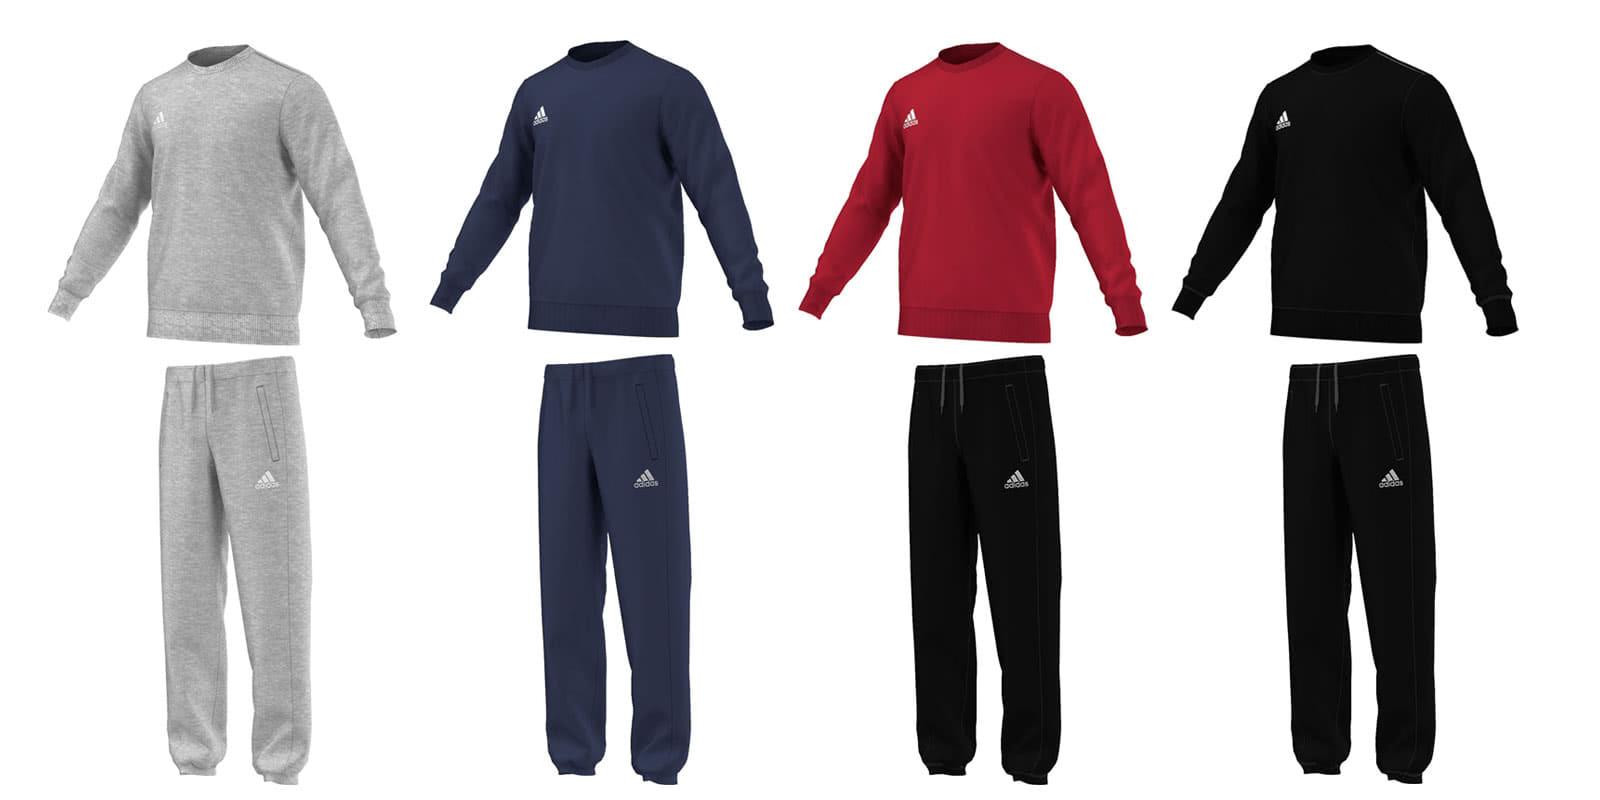 adidas jogginganzug core 15 sportartikel und. Black Bedroom Furniture Sets. Home Design Ideas